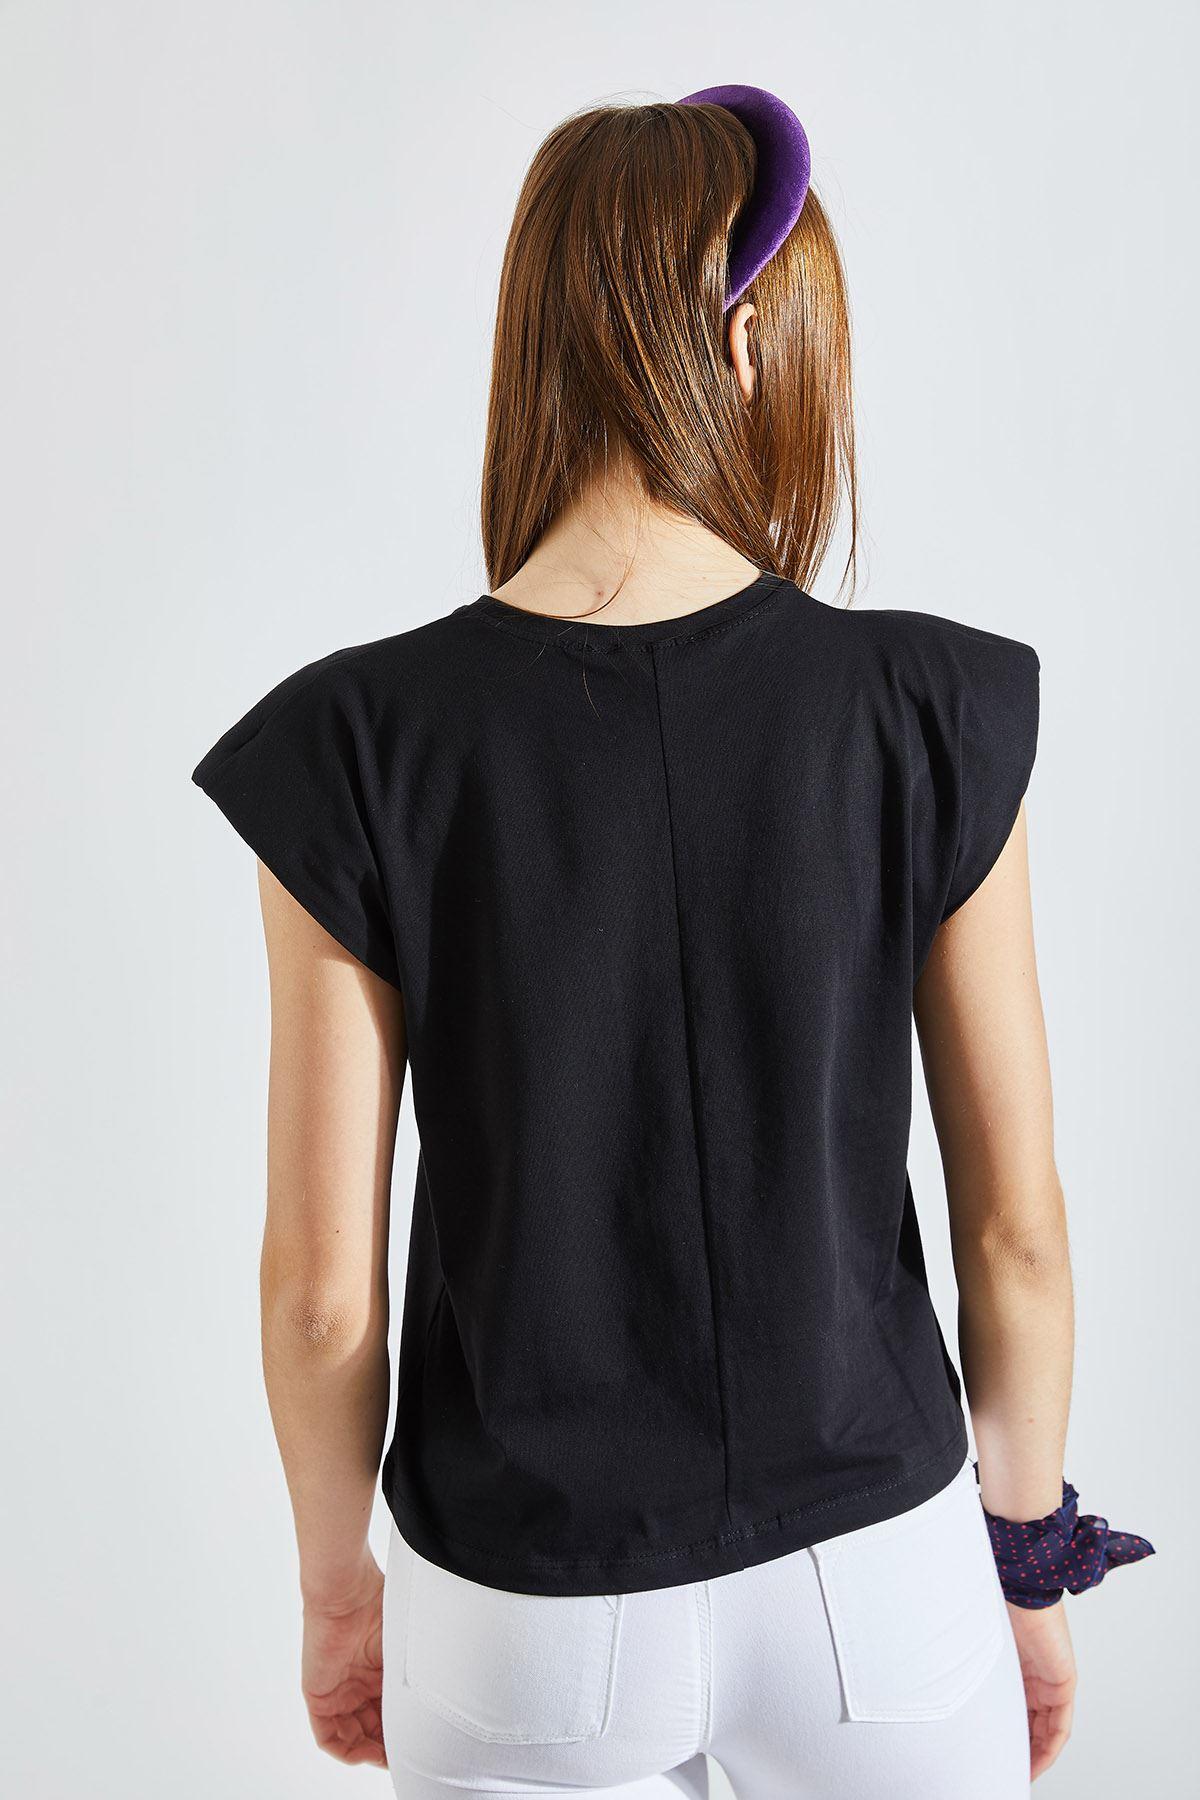 Kadın Vatkalı Siyah Tişört